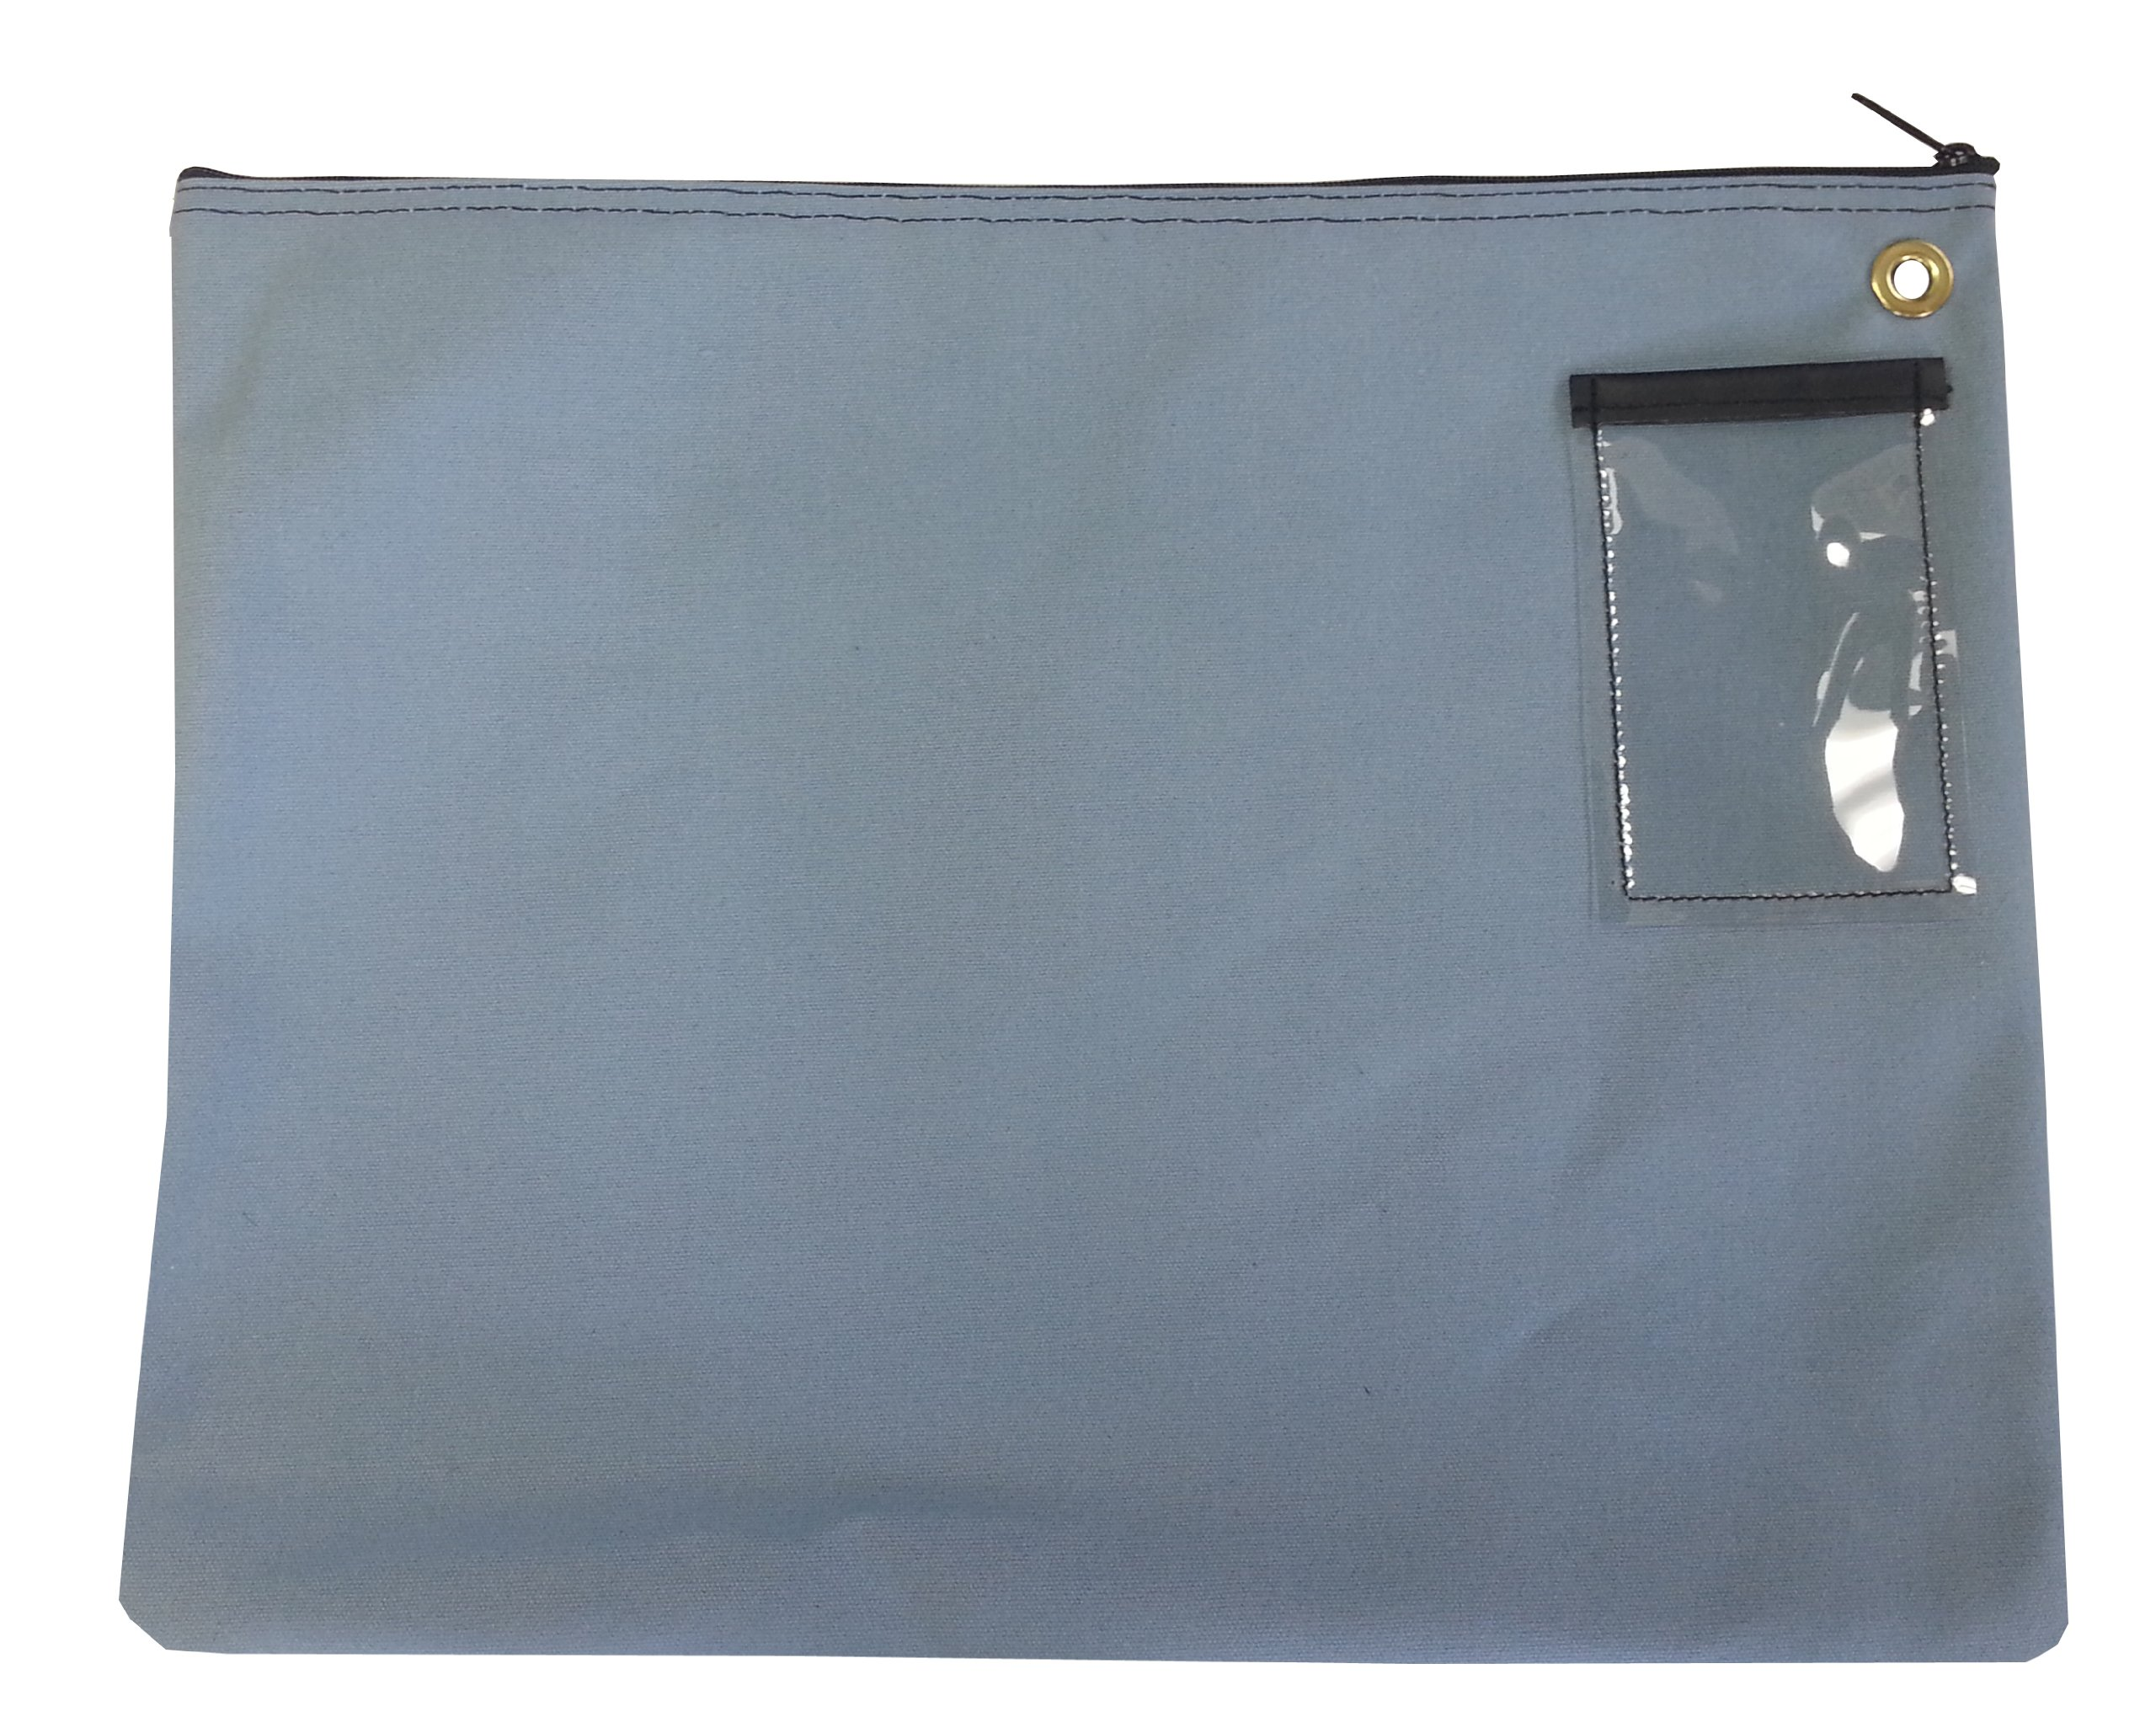 Interoffice Mailer Canvas Transit Sack Zipper Bag 18w x 14w Gray/Blue by Cardinal bag supplies